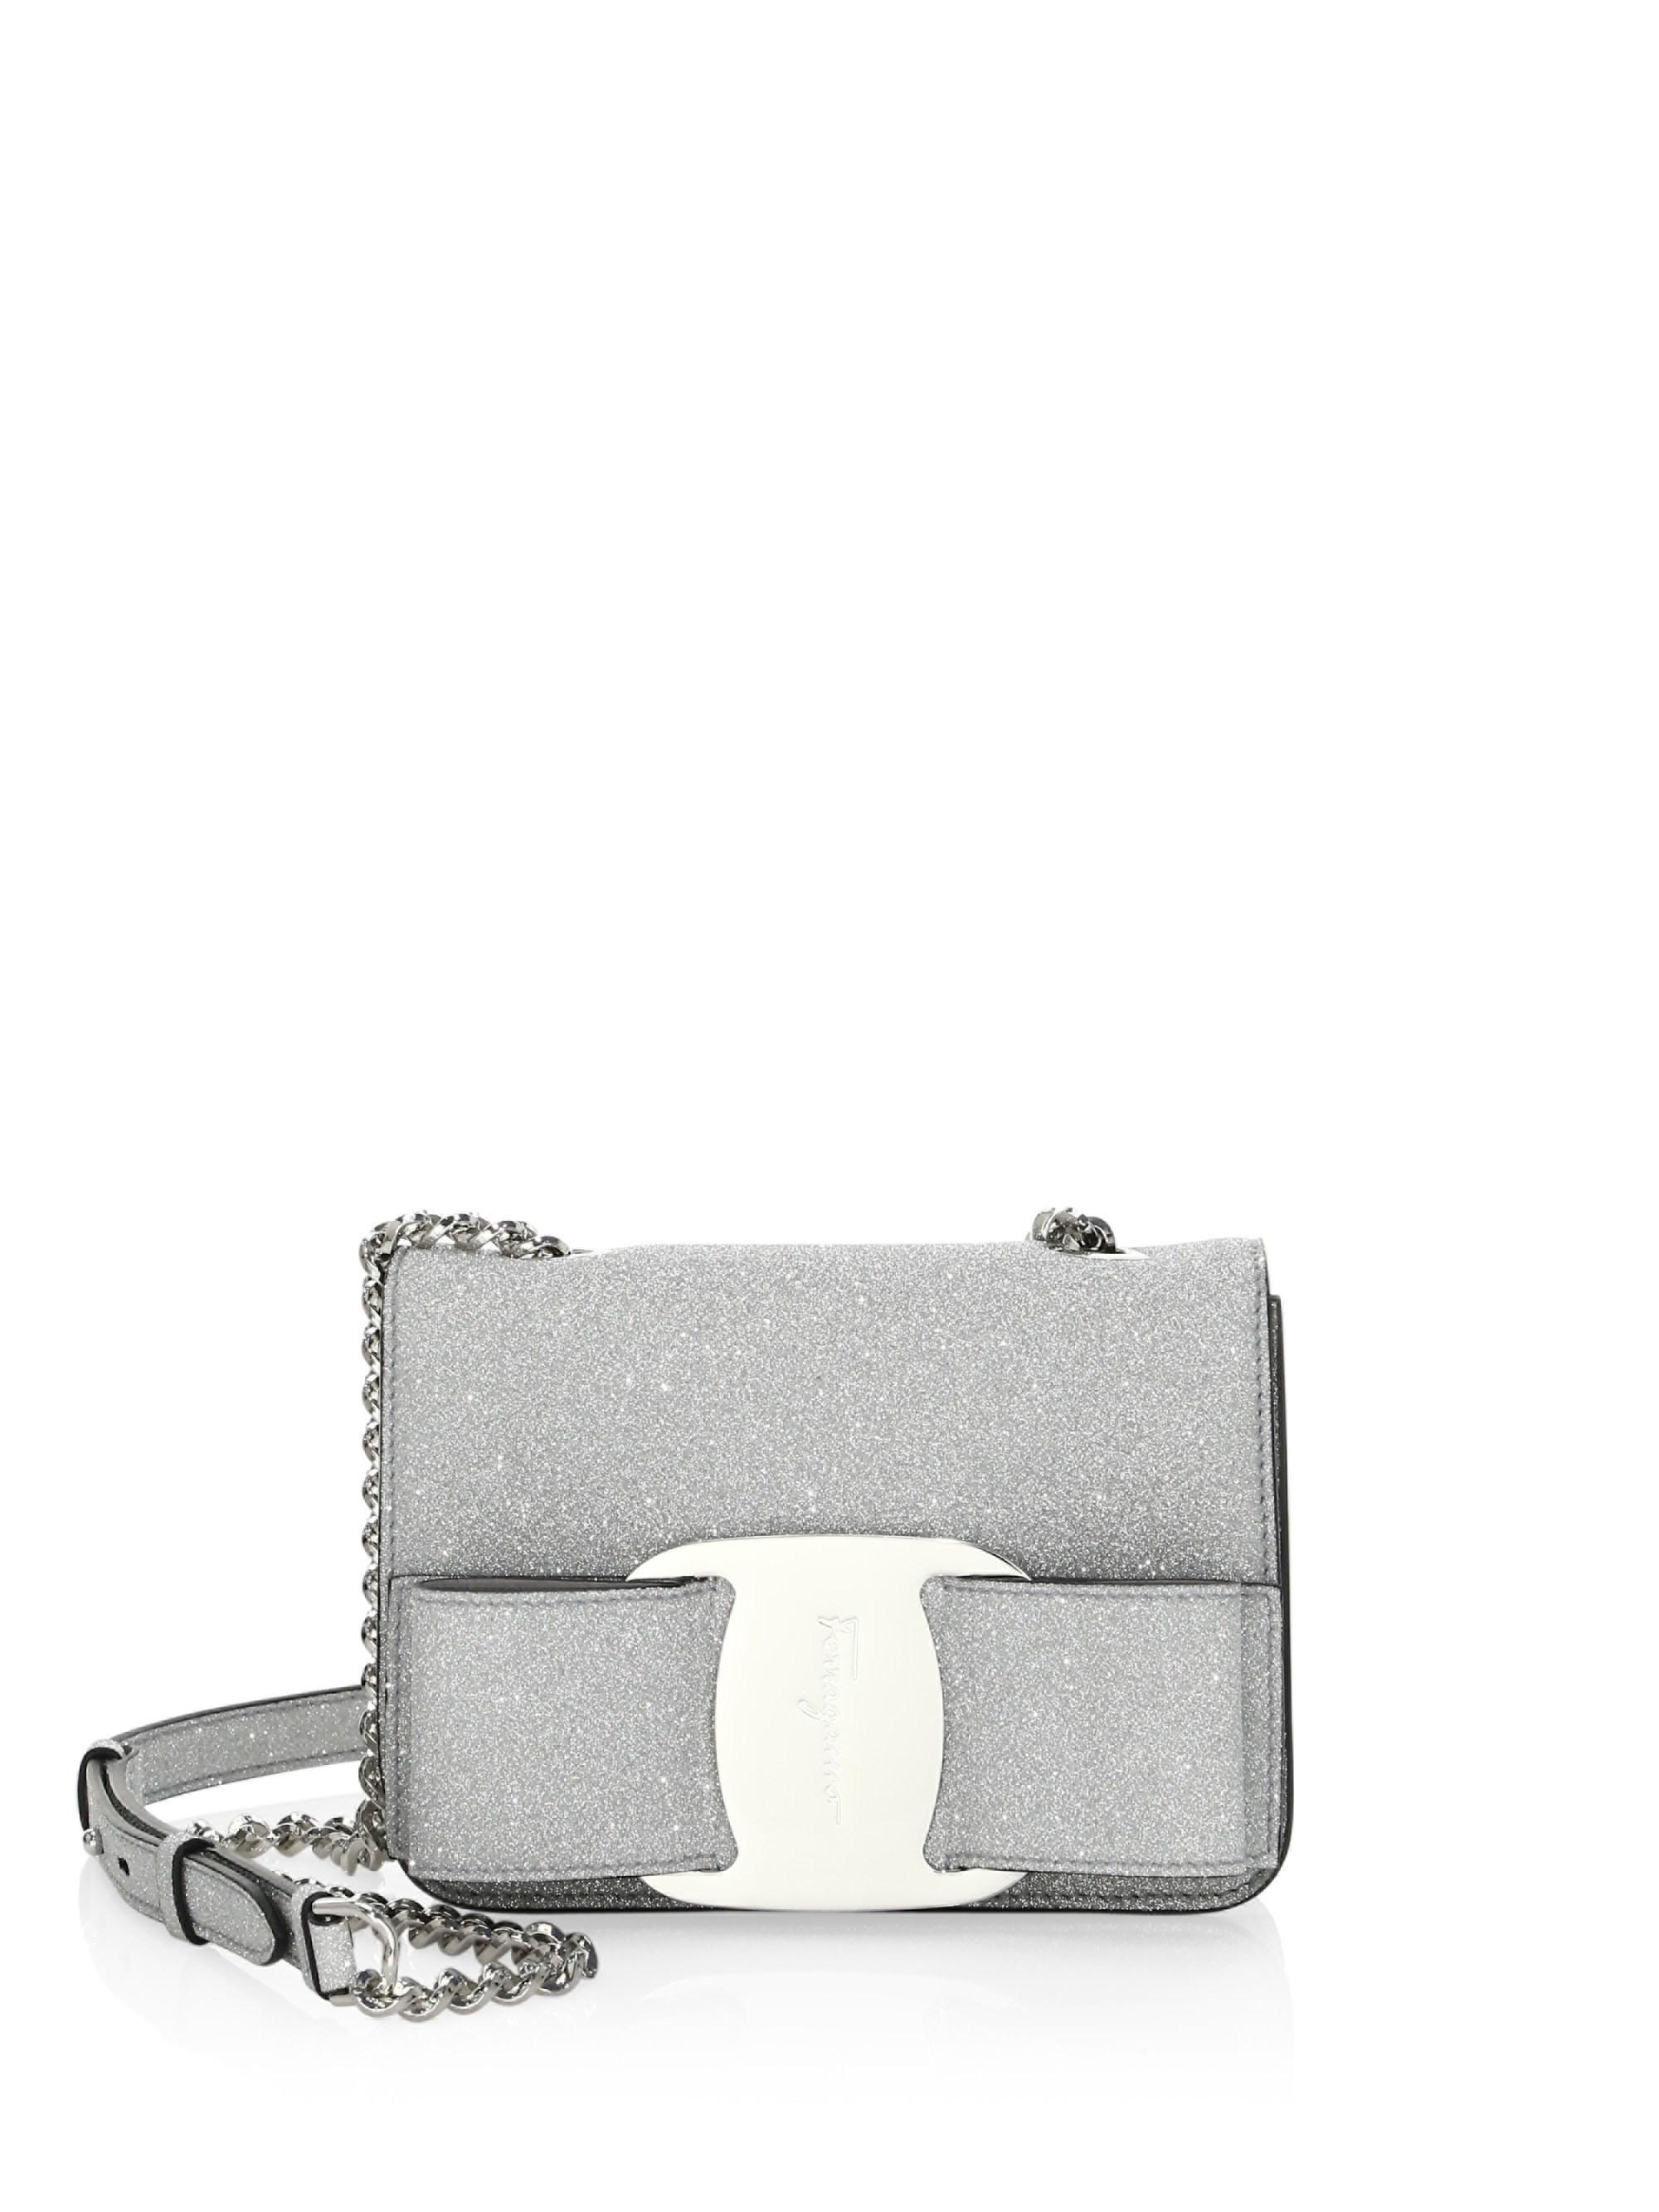 d78fd0cc3c0d Lyst - Ferragamo Vara Bow Bag in Metallic - Save 10%